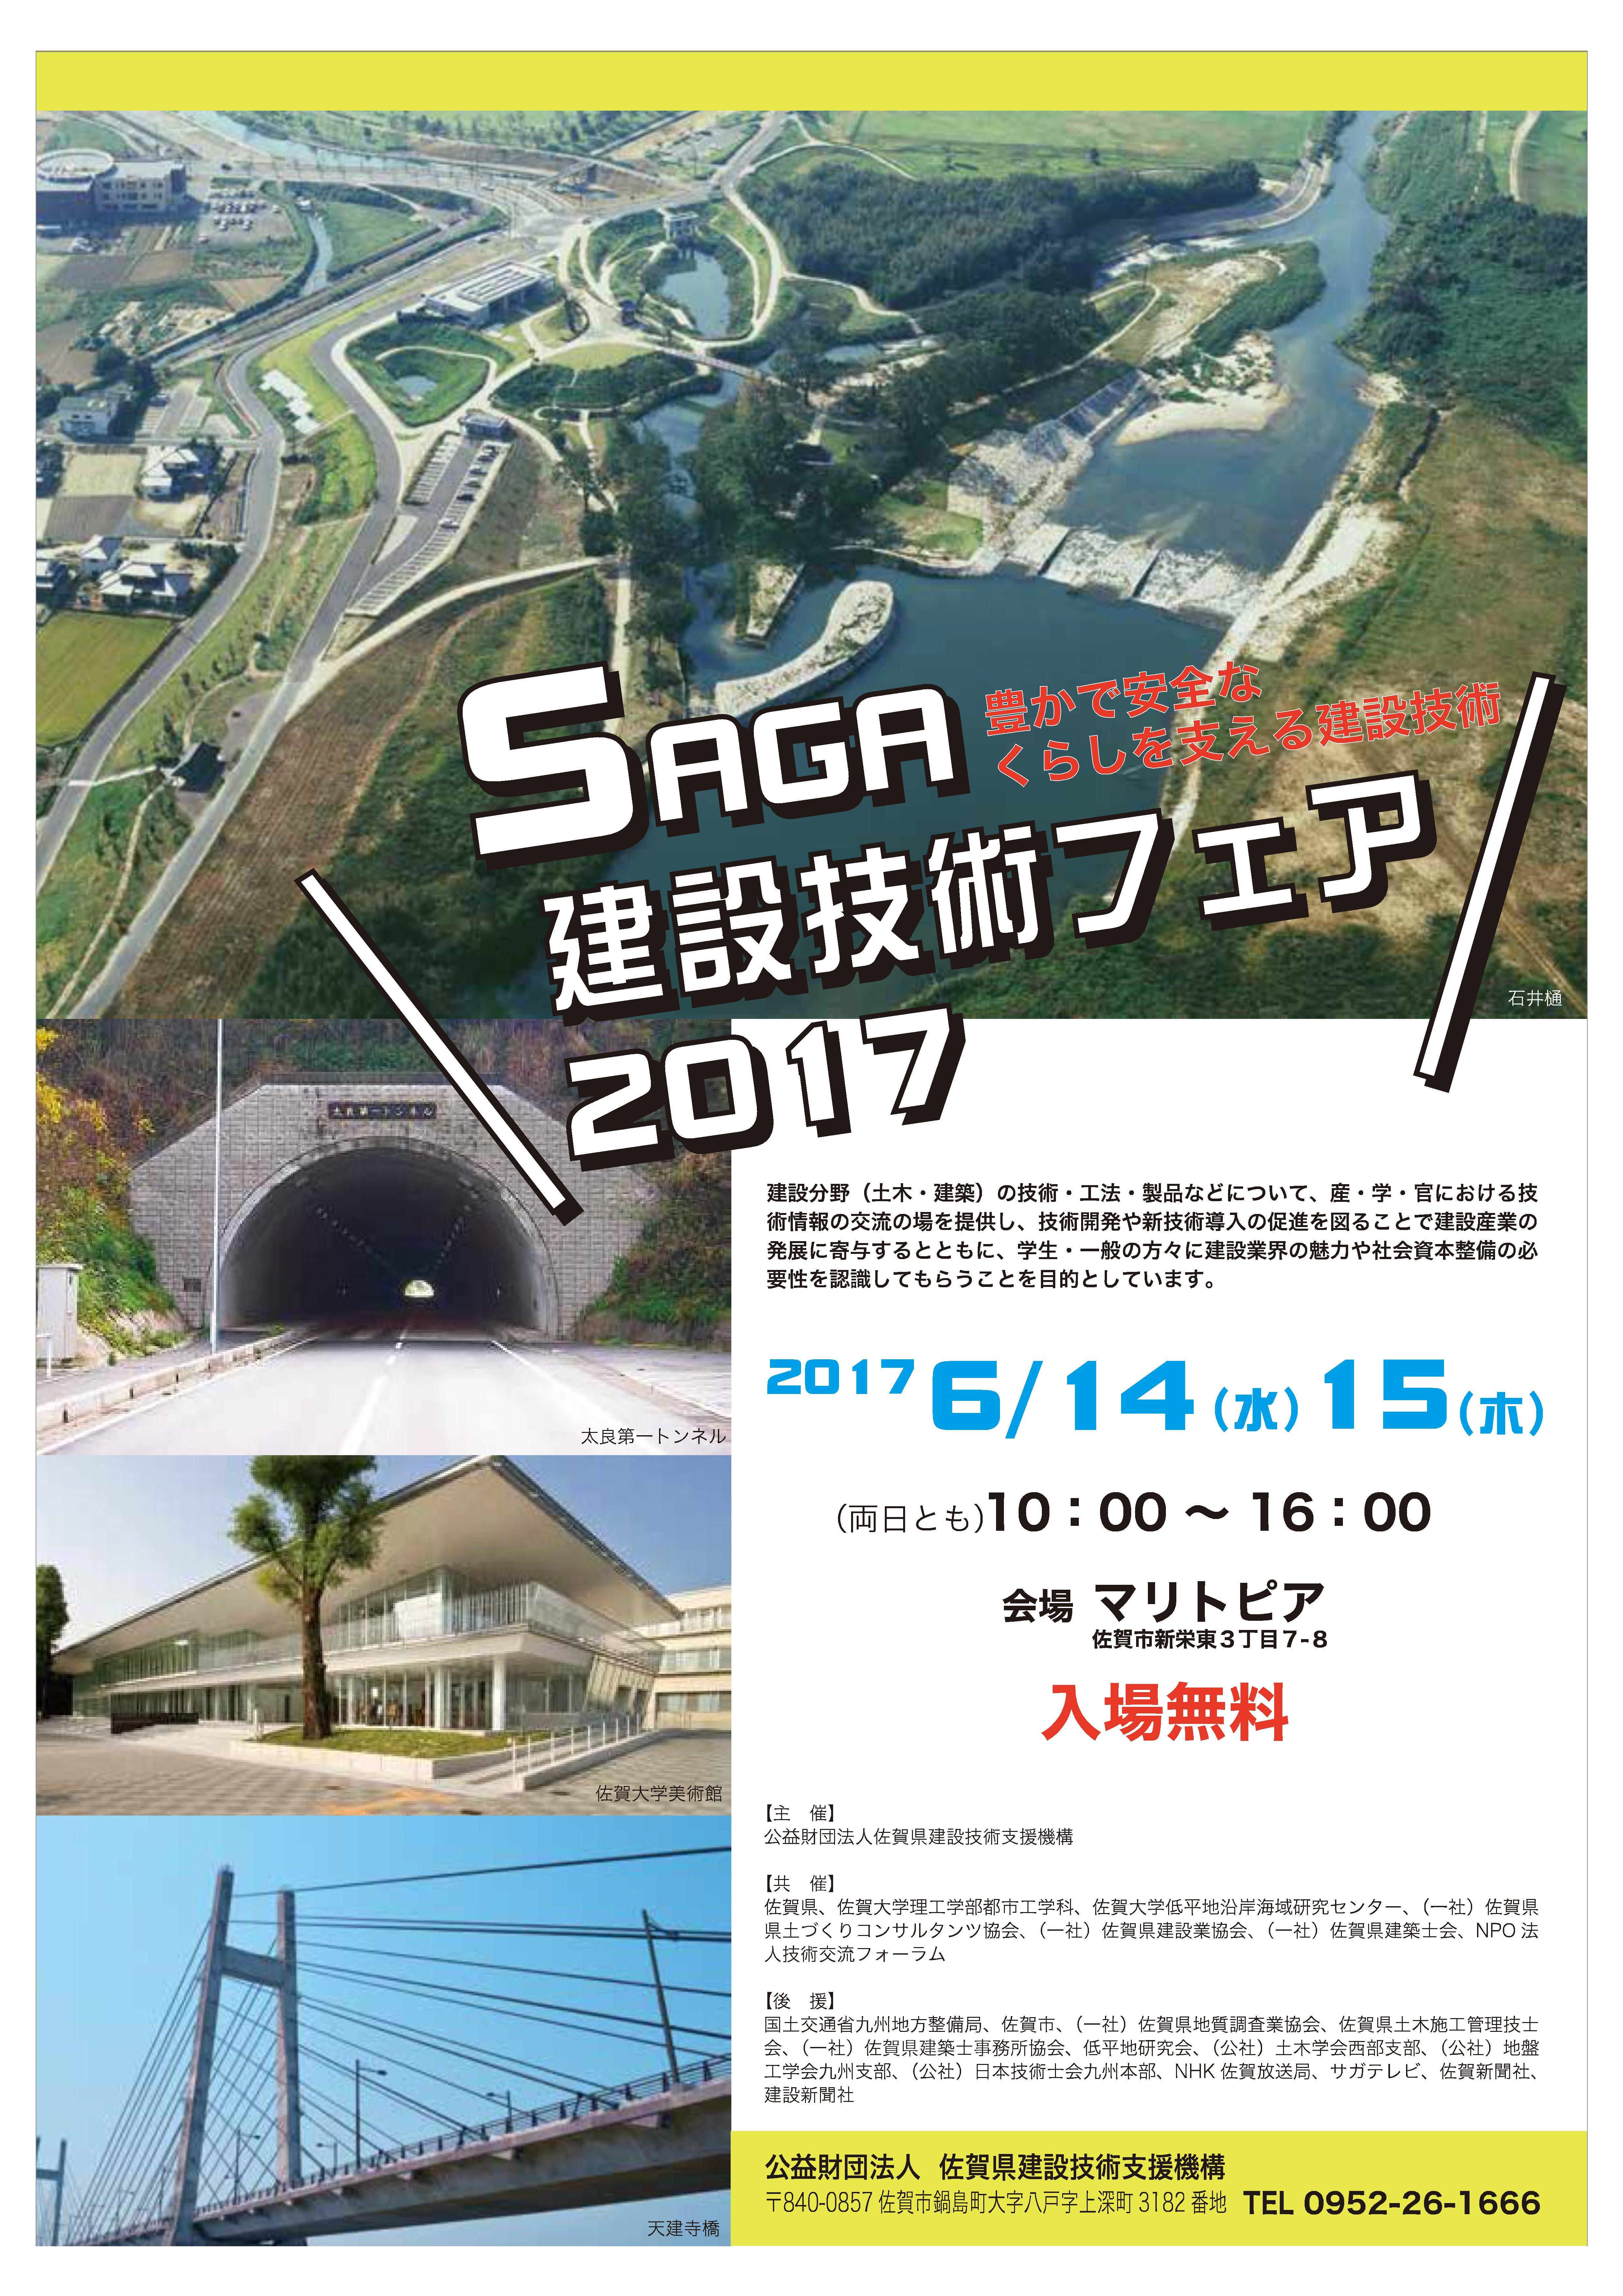 「SAGA建設技術フェア2017」出展のお知らせ